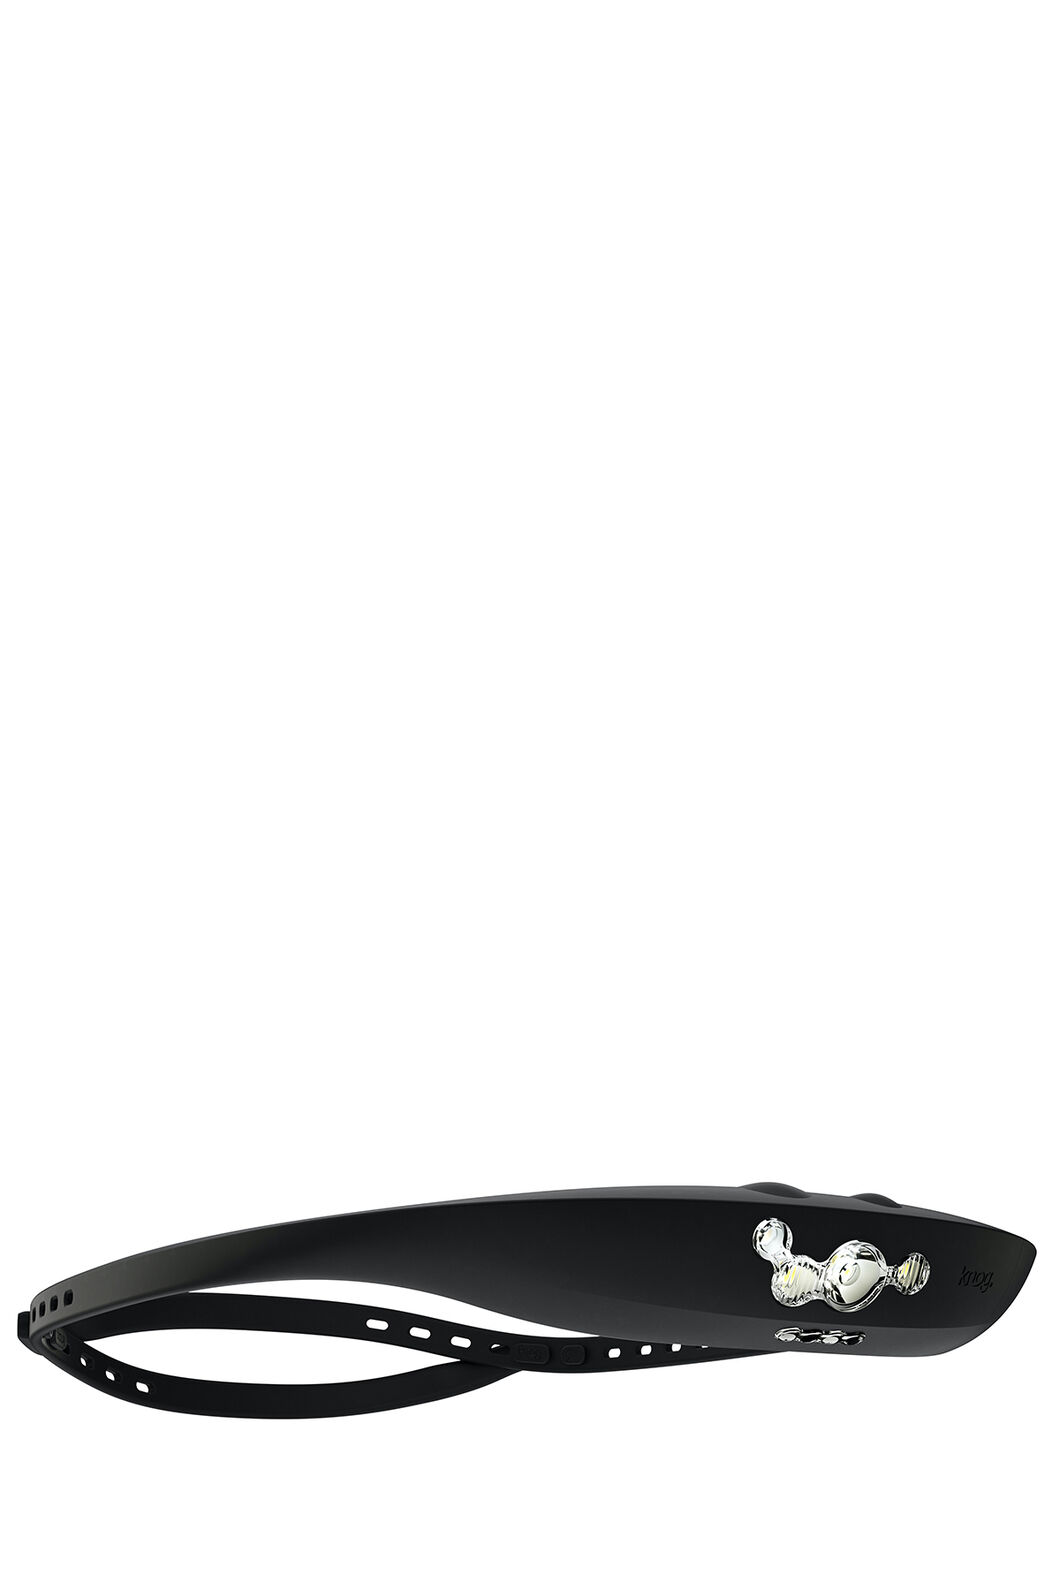 Knog Bandicoot Headlamp — 100 Lumens, Black, hi-res